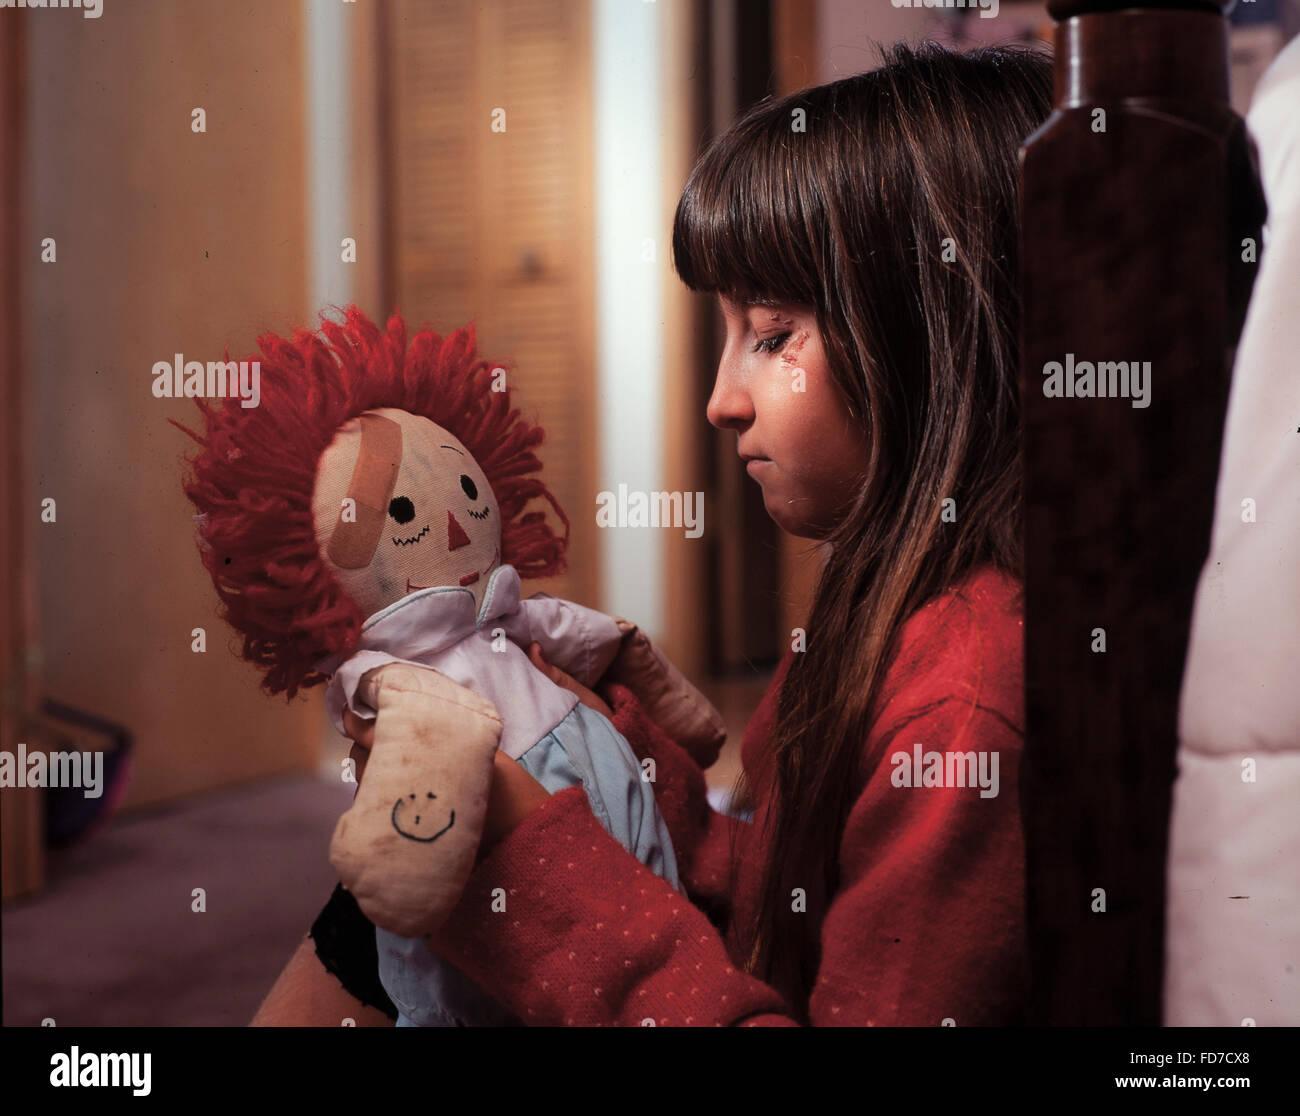 Sad young injured girl with bandaged doll. - Stock Image